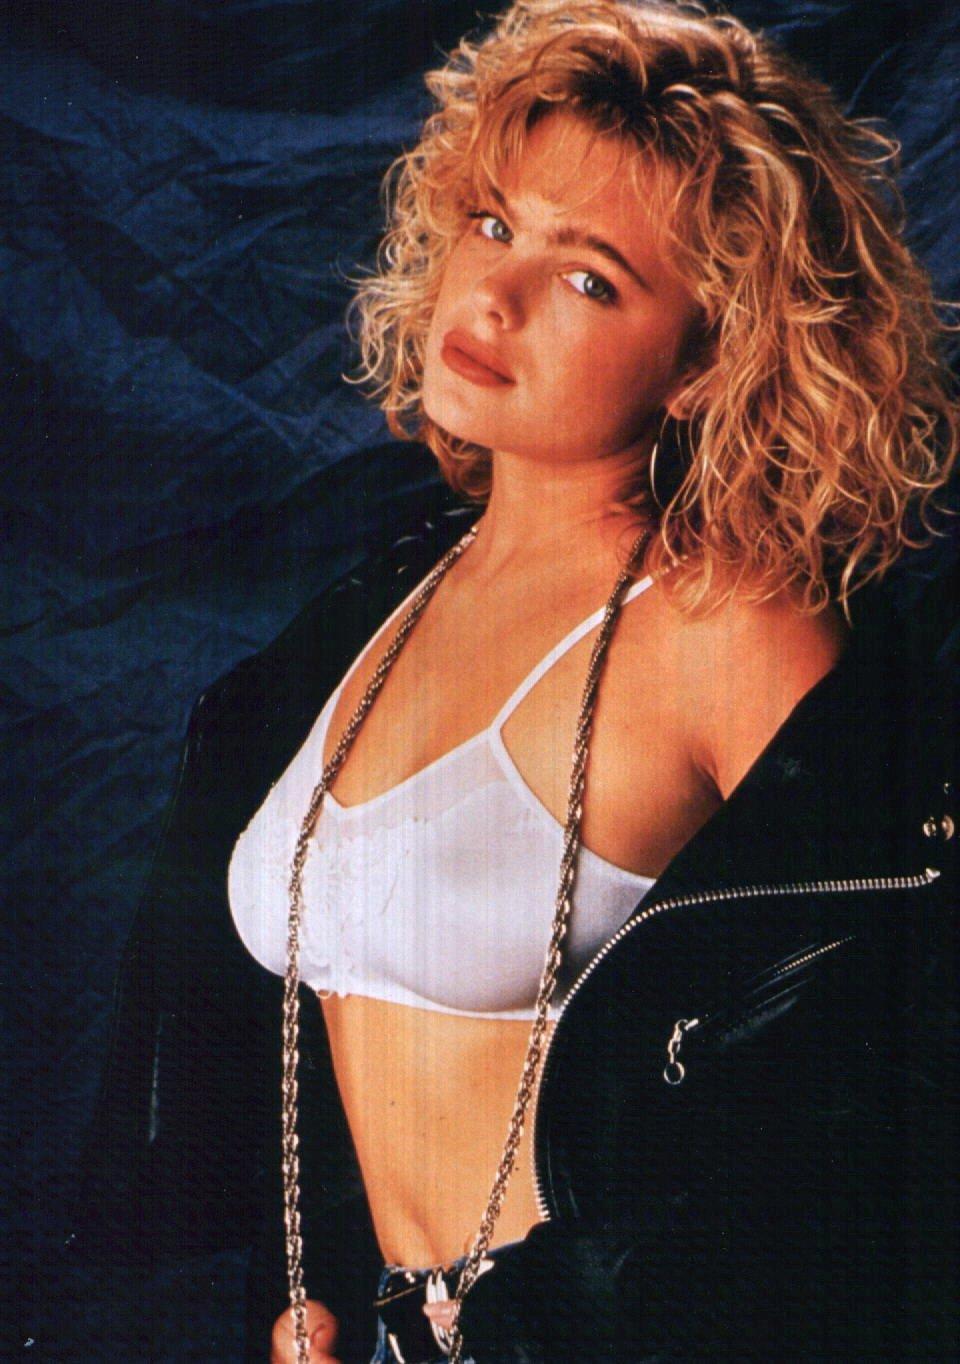 Erika Eleniak nackt, Oben ohne Bilder, Playboy Fotos,